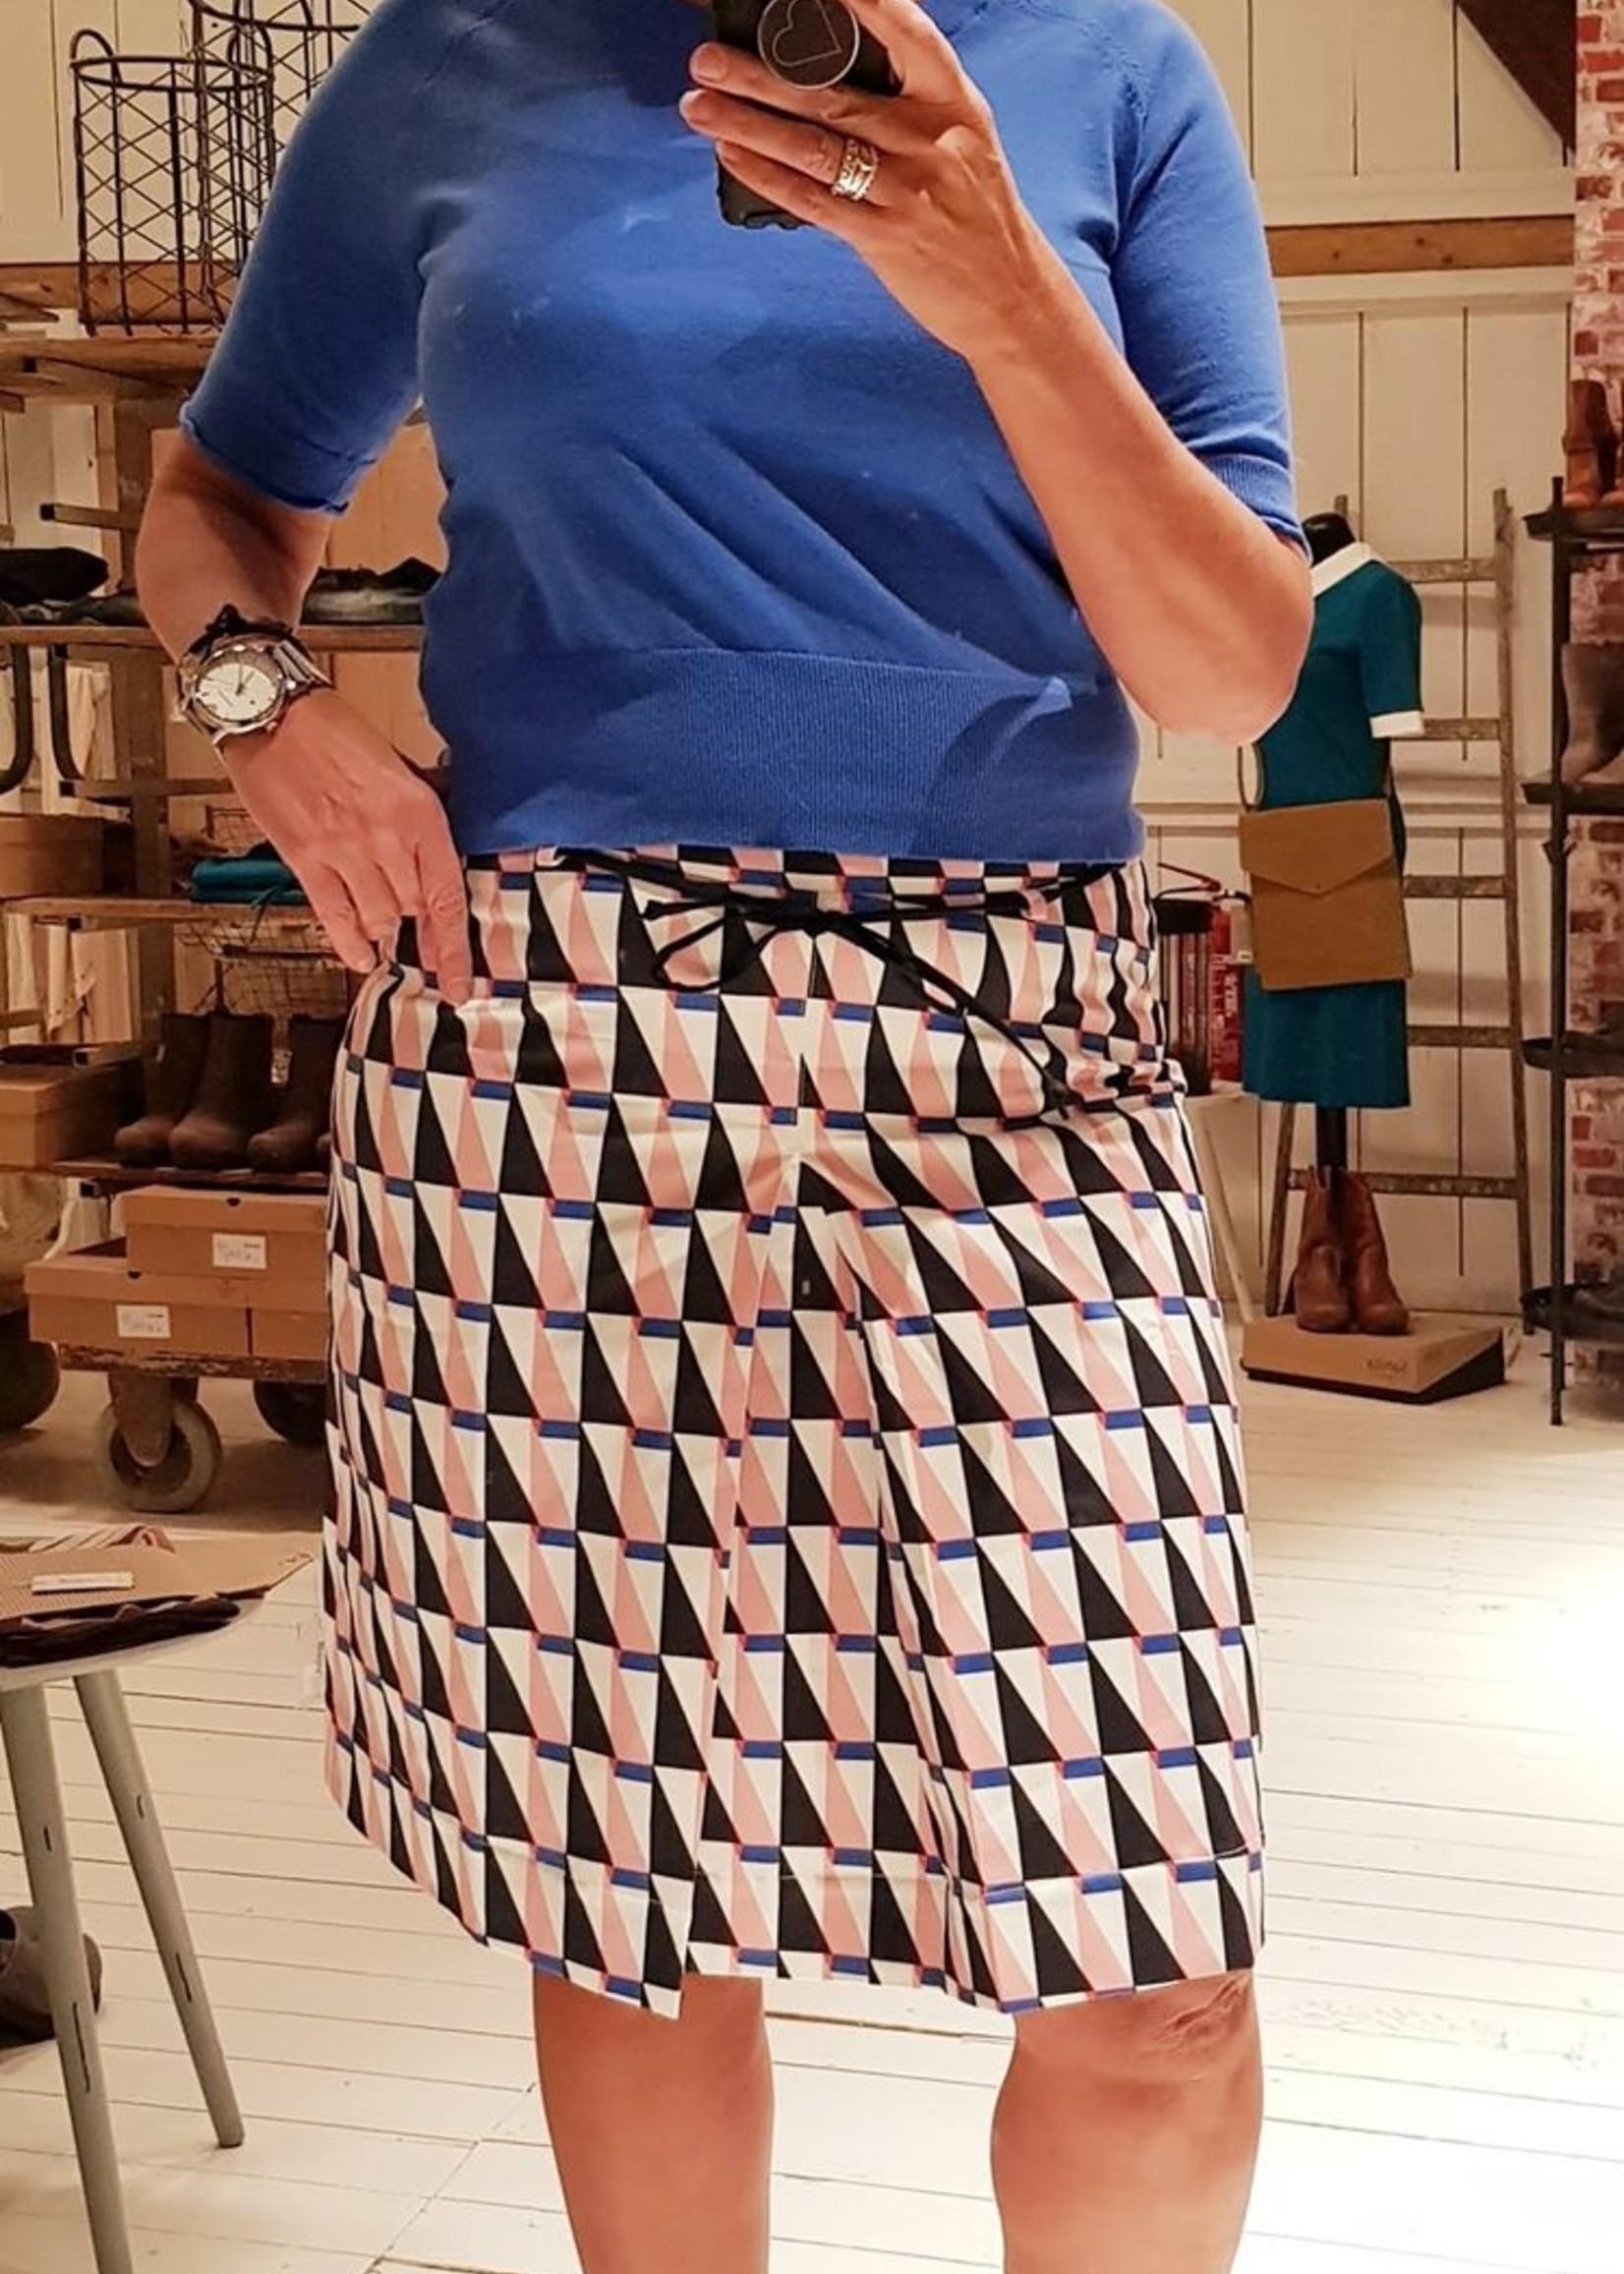 LEPEP Lepep Skirt Angie Navy